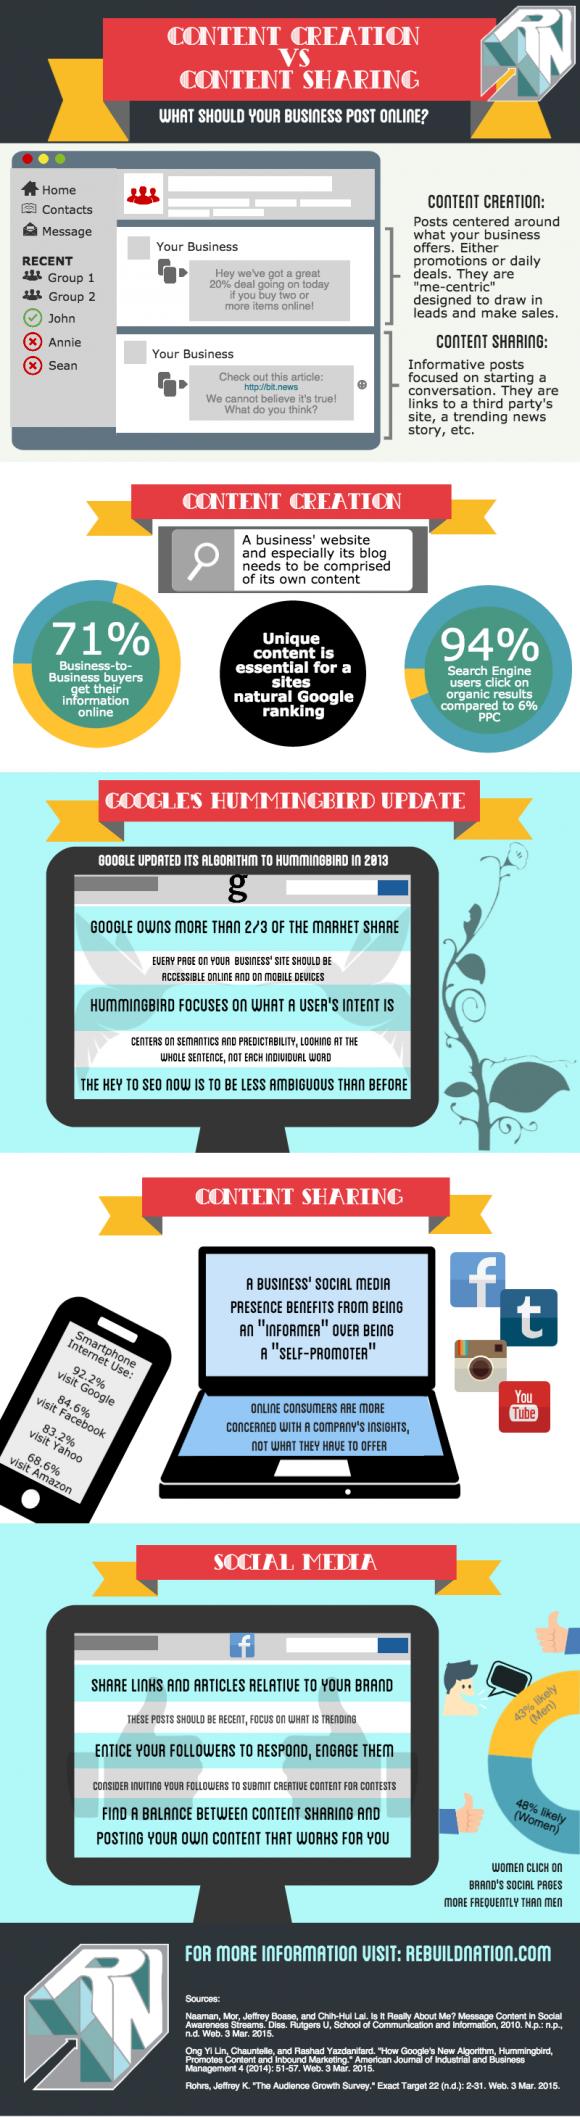 Content Creation versus content Sharing